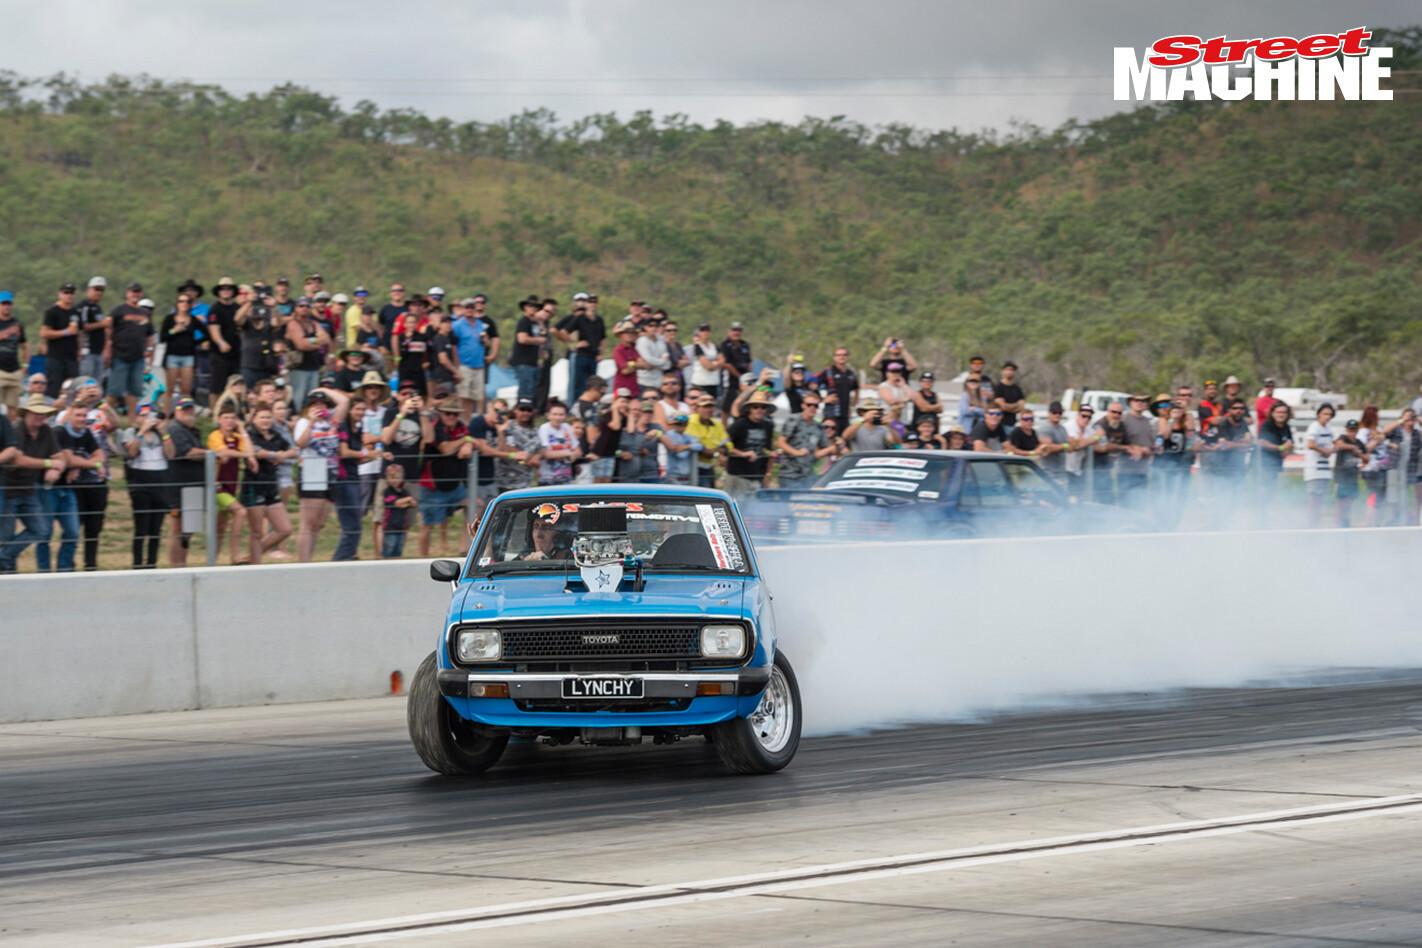 Lynchy V8 Corolla Burnout